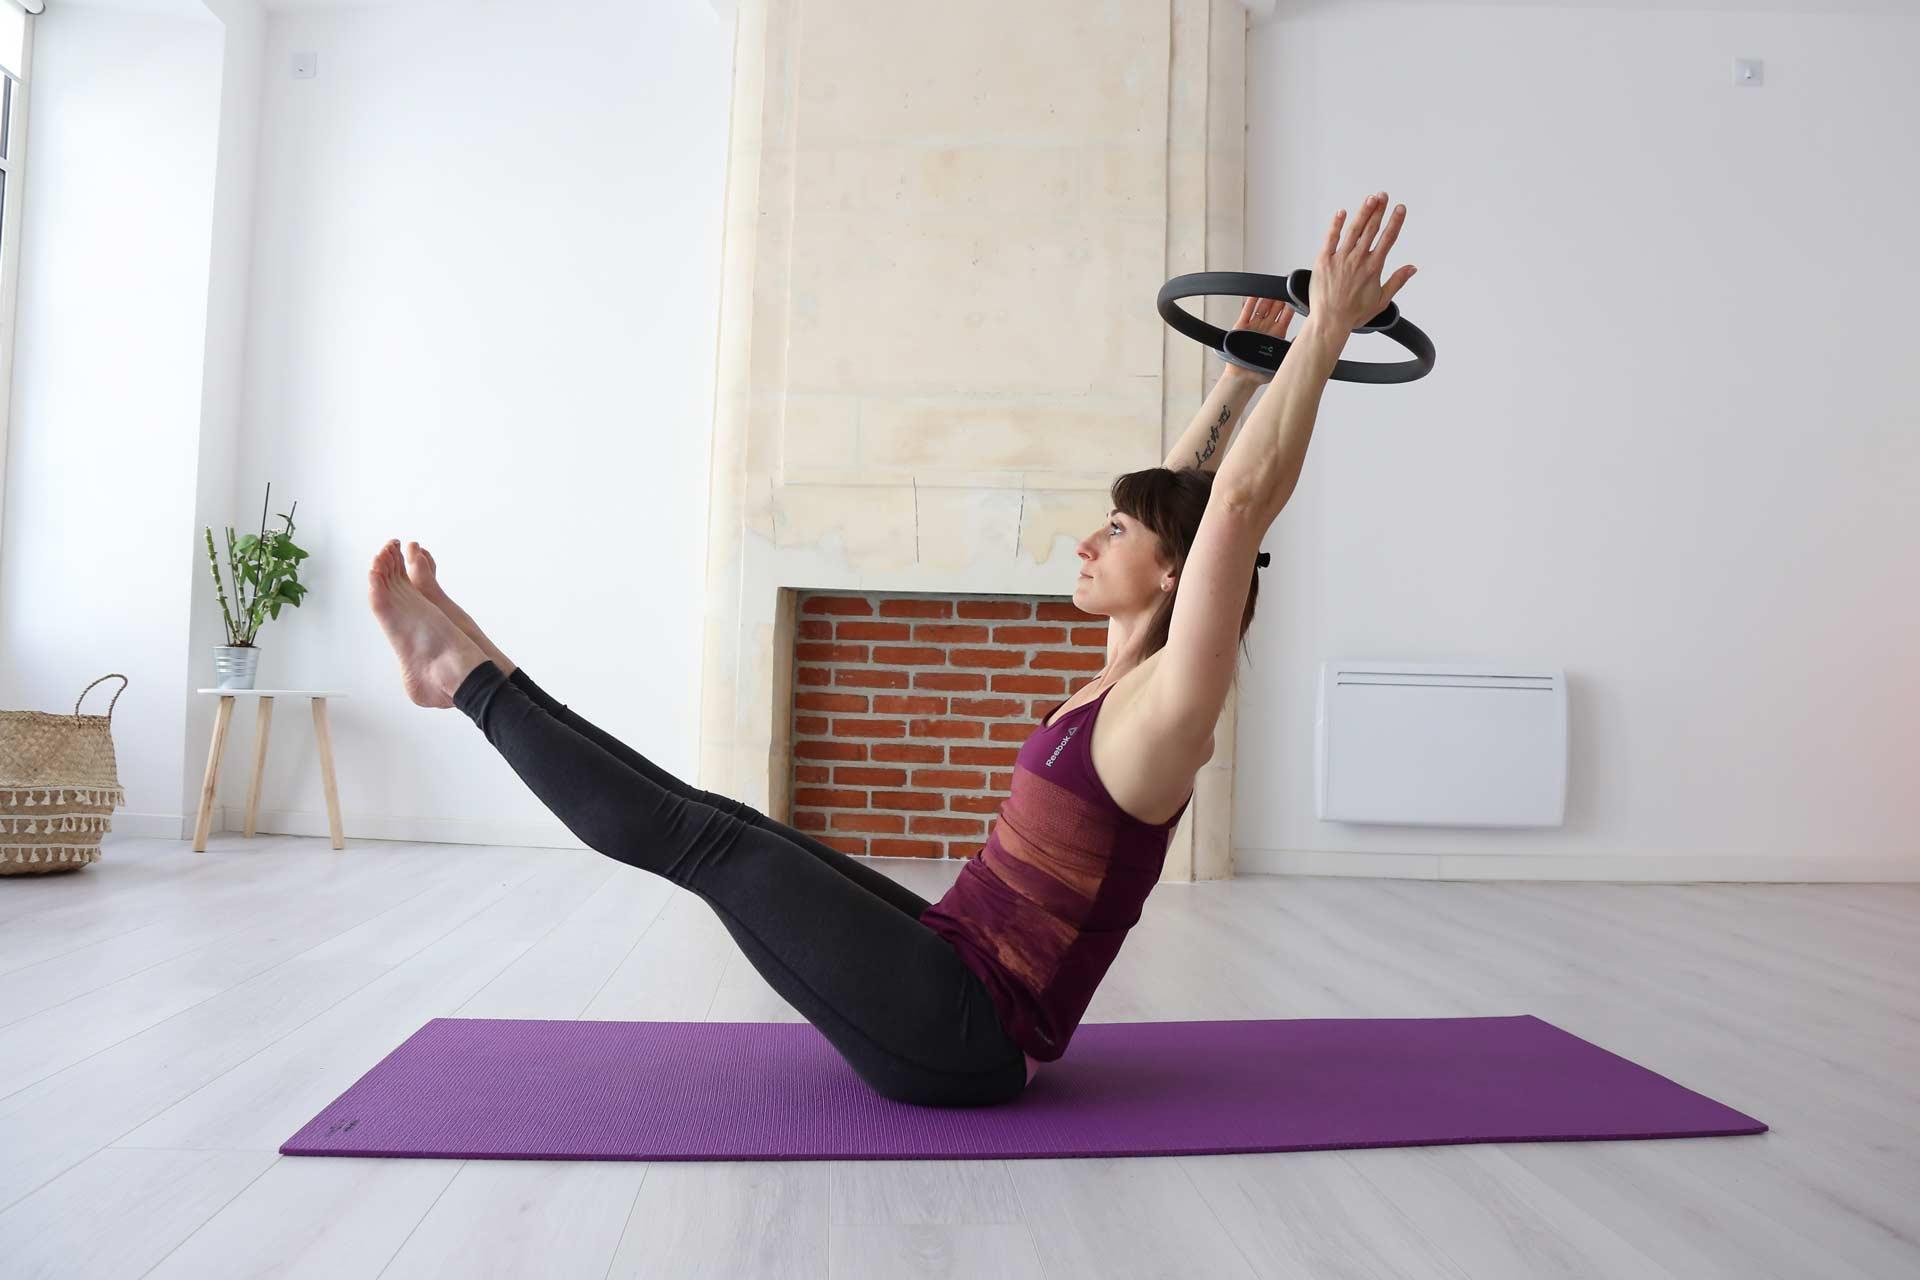 Alexandra-Siano-Professeur-pilates-yoga-jonzac-royan-bordeaux-8